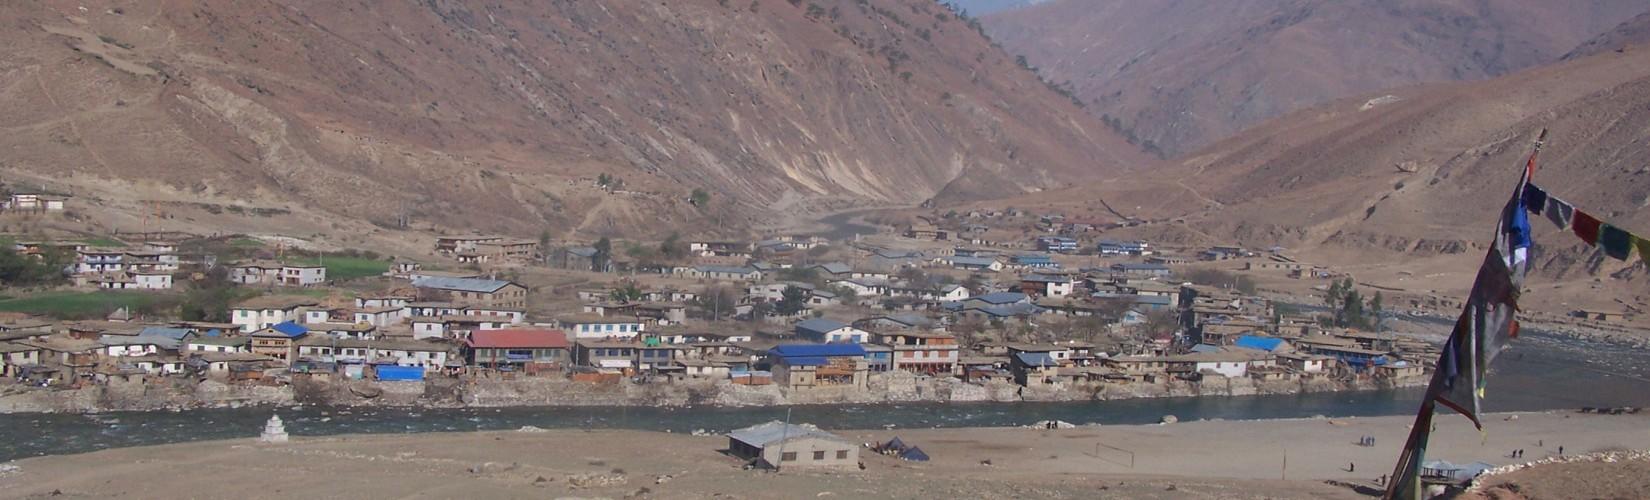 Dunai bazaar Upper Dolpo Trek in Nepal